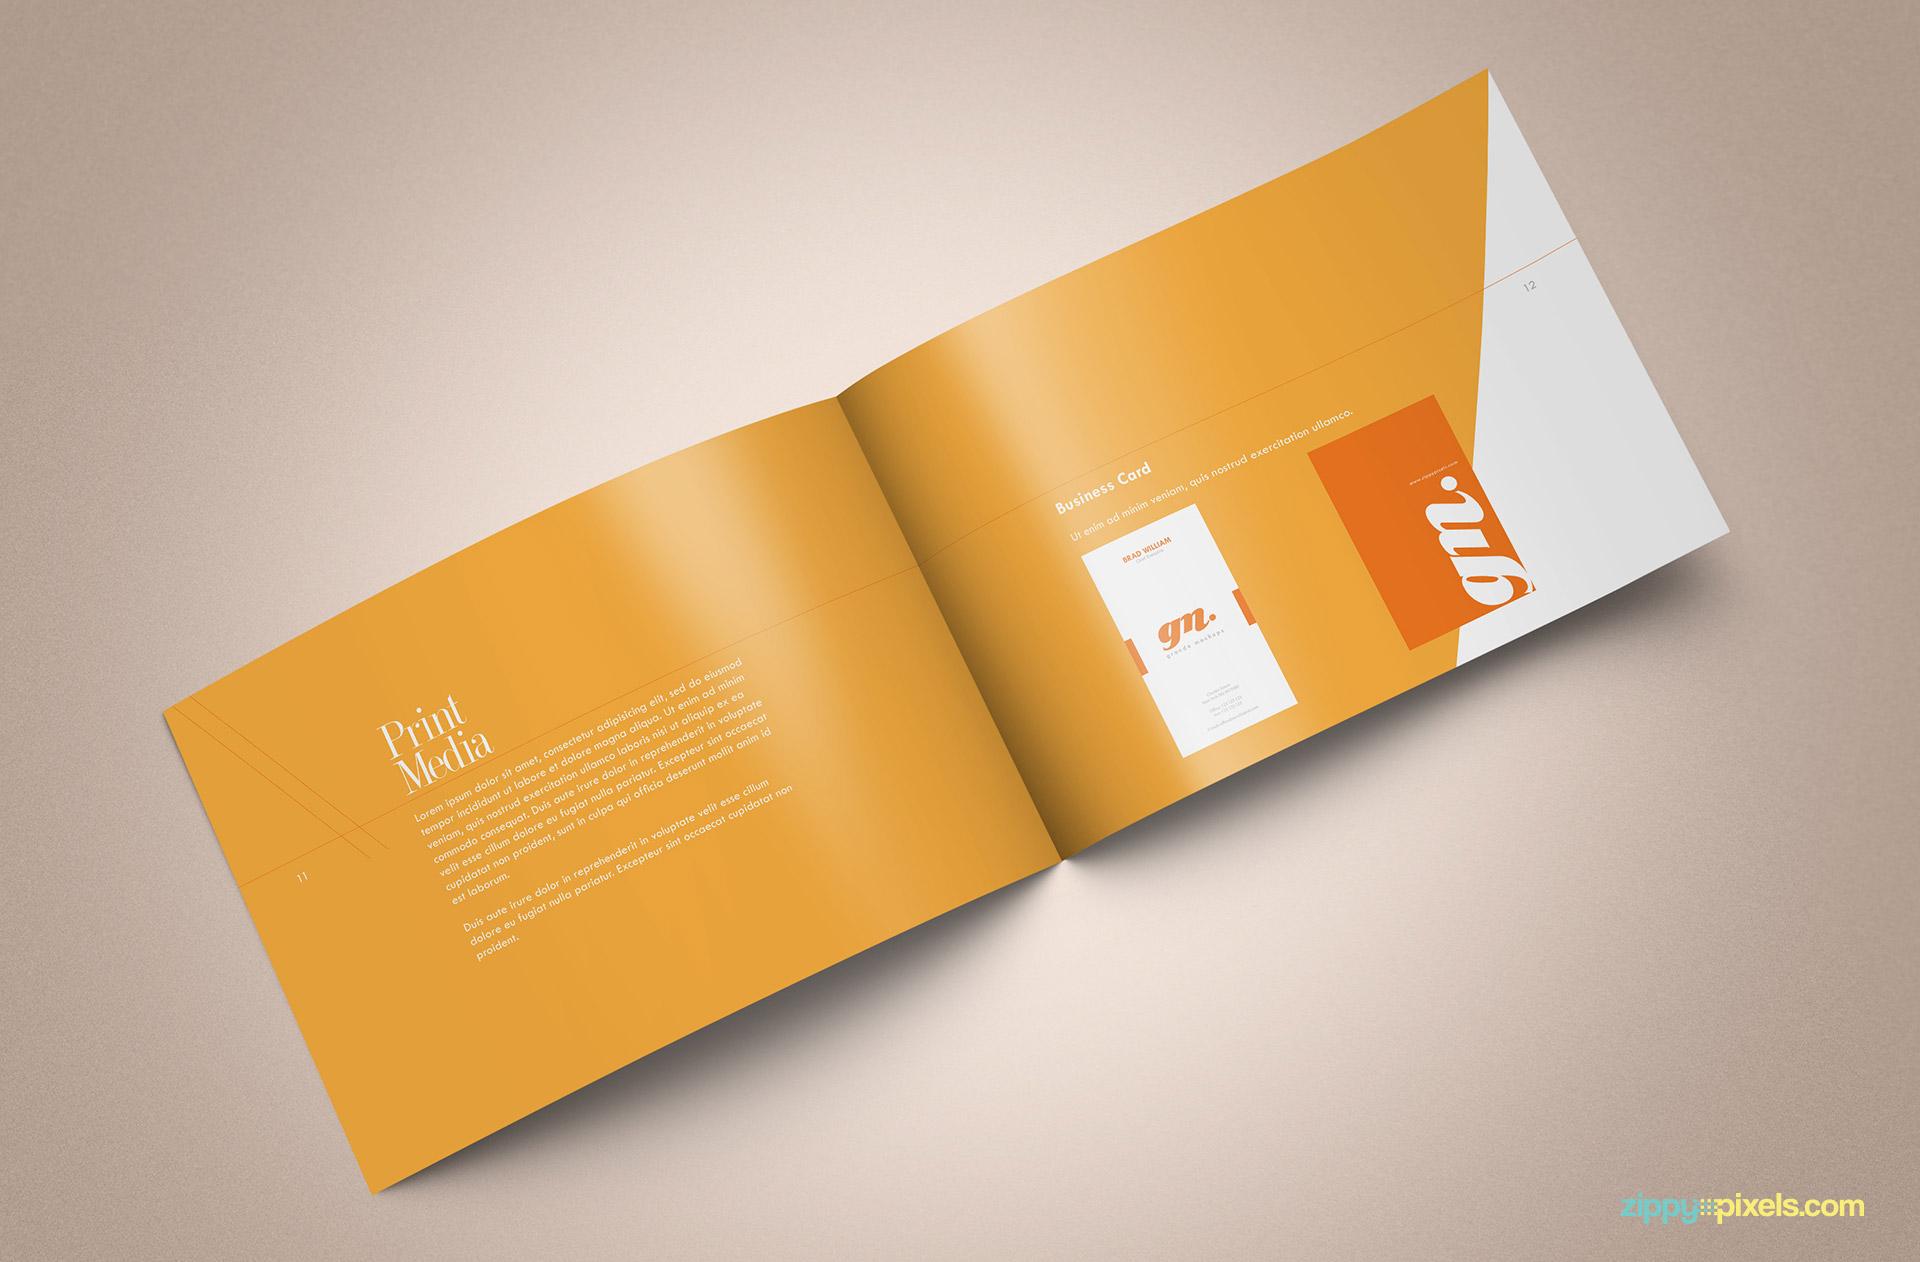 09-brand-book-4-print-media